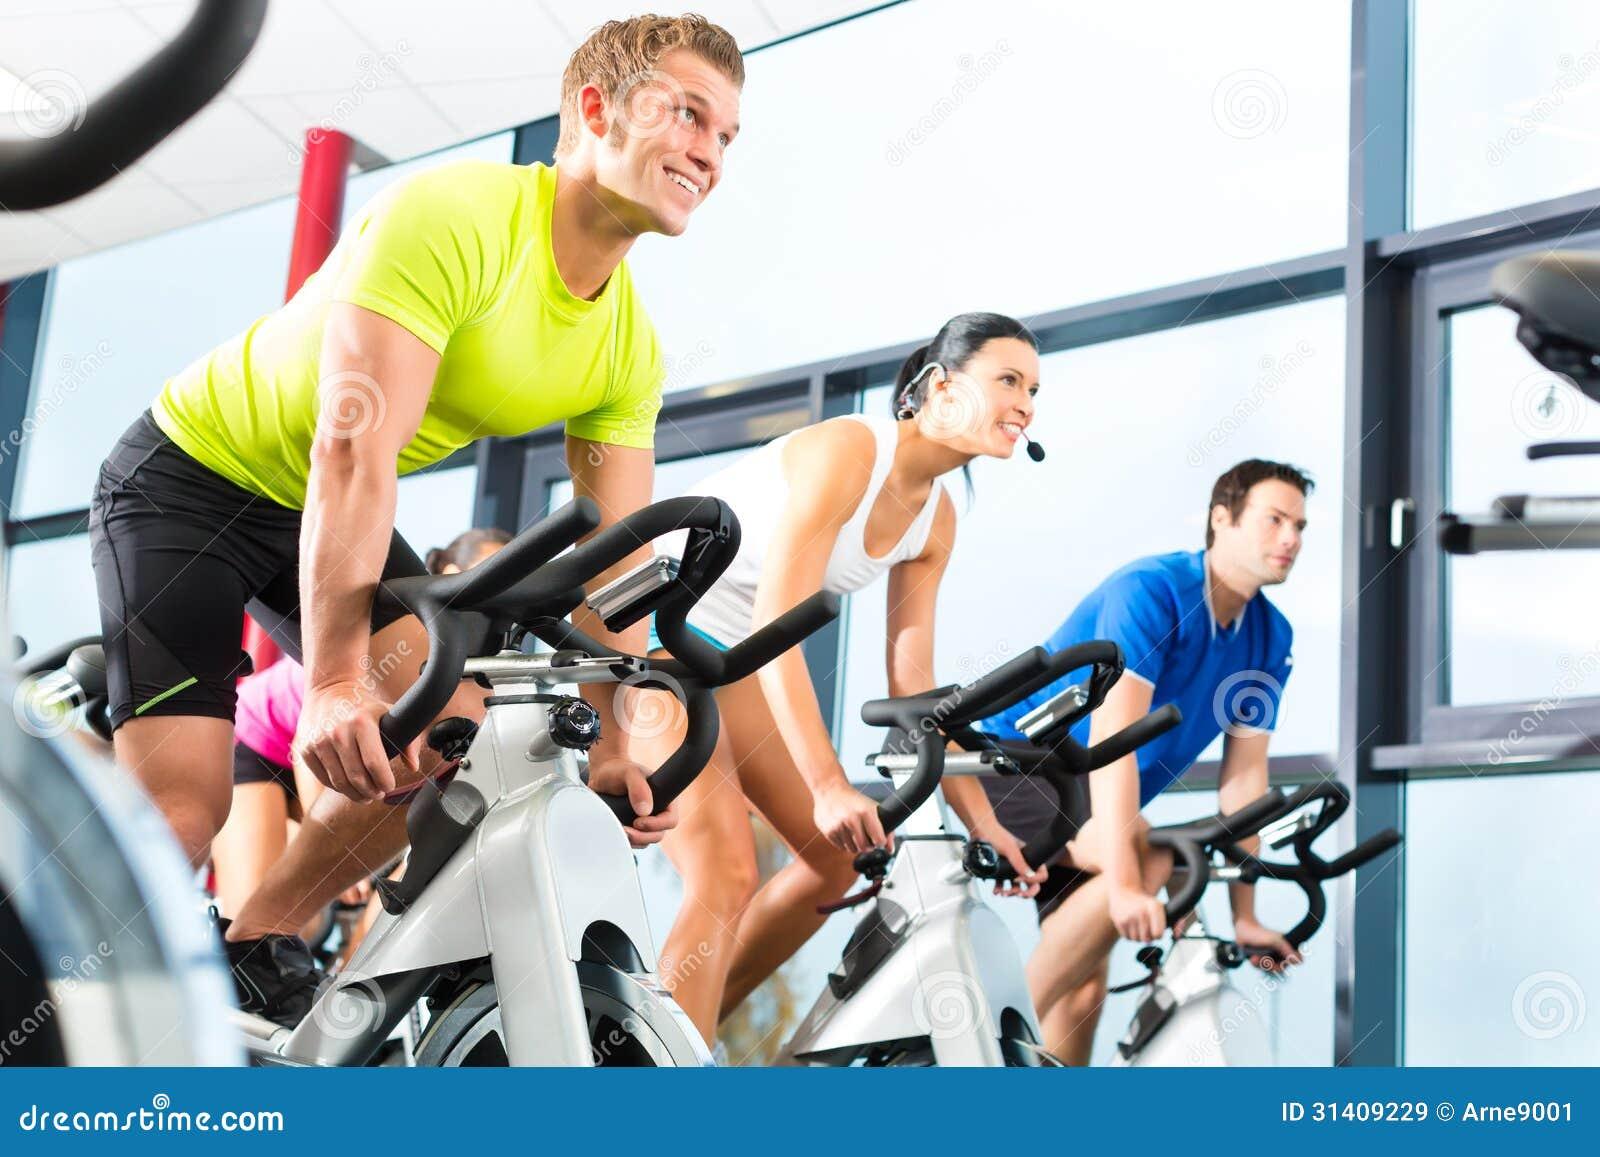 Inomhus bycicle som cyklar i idrottshall